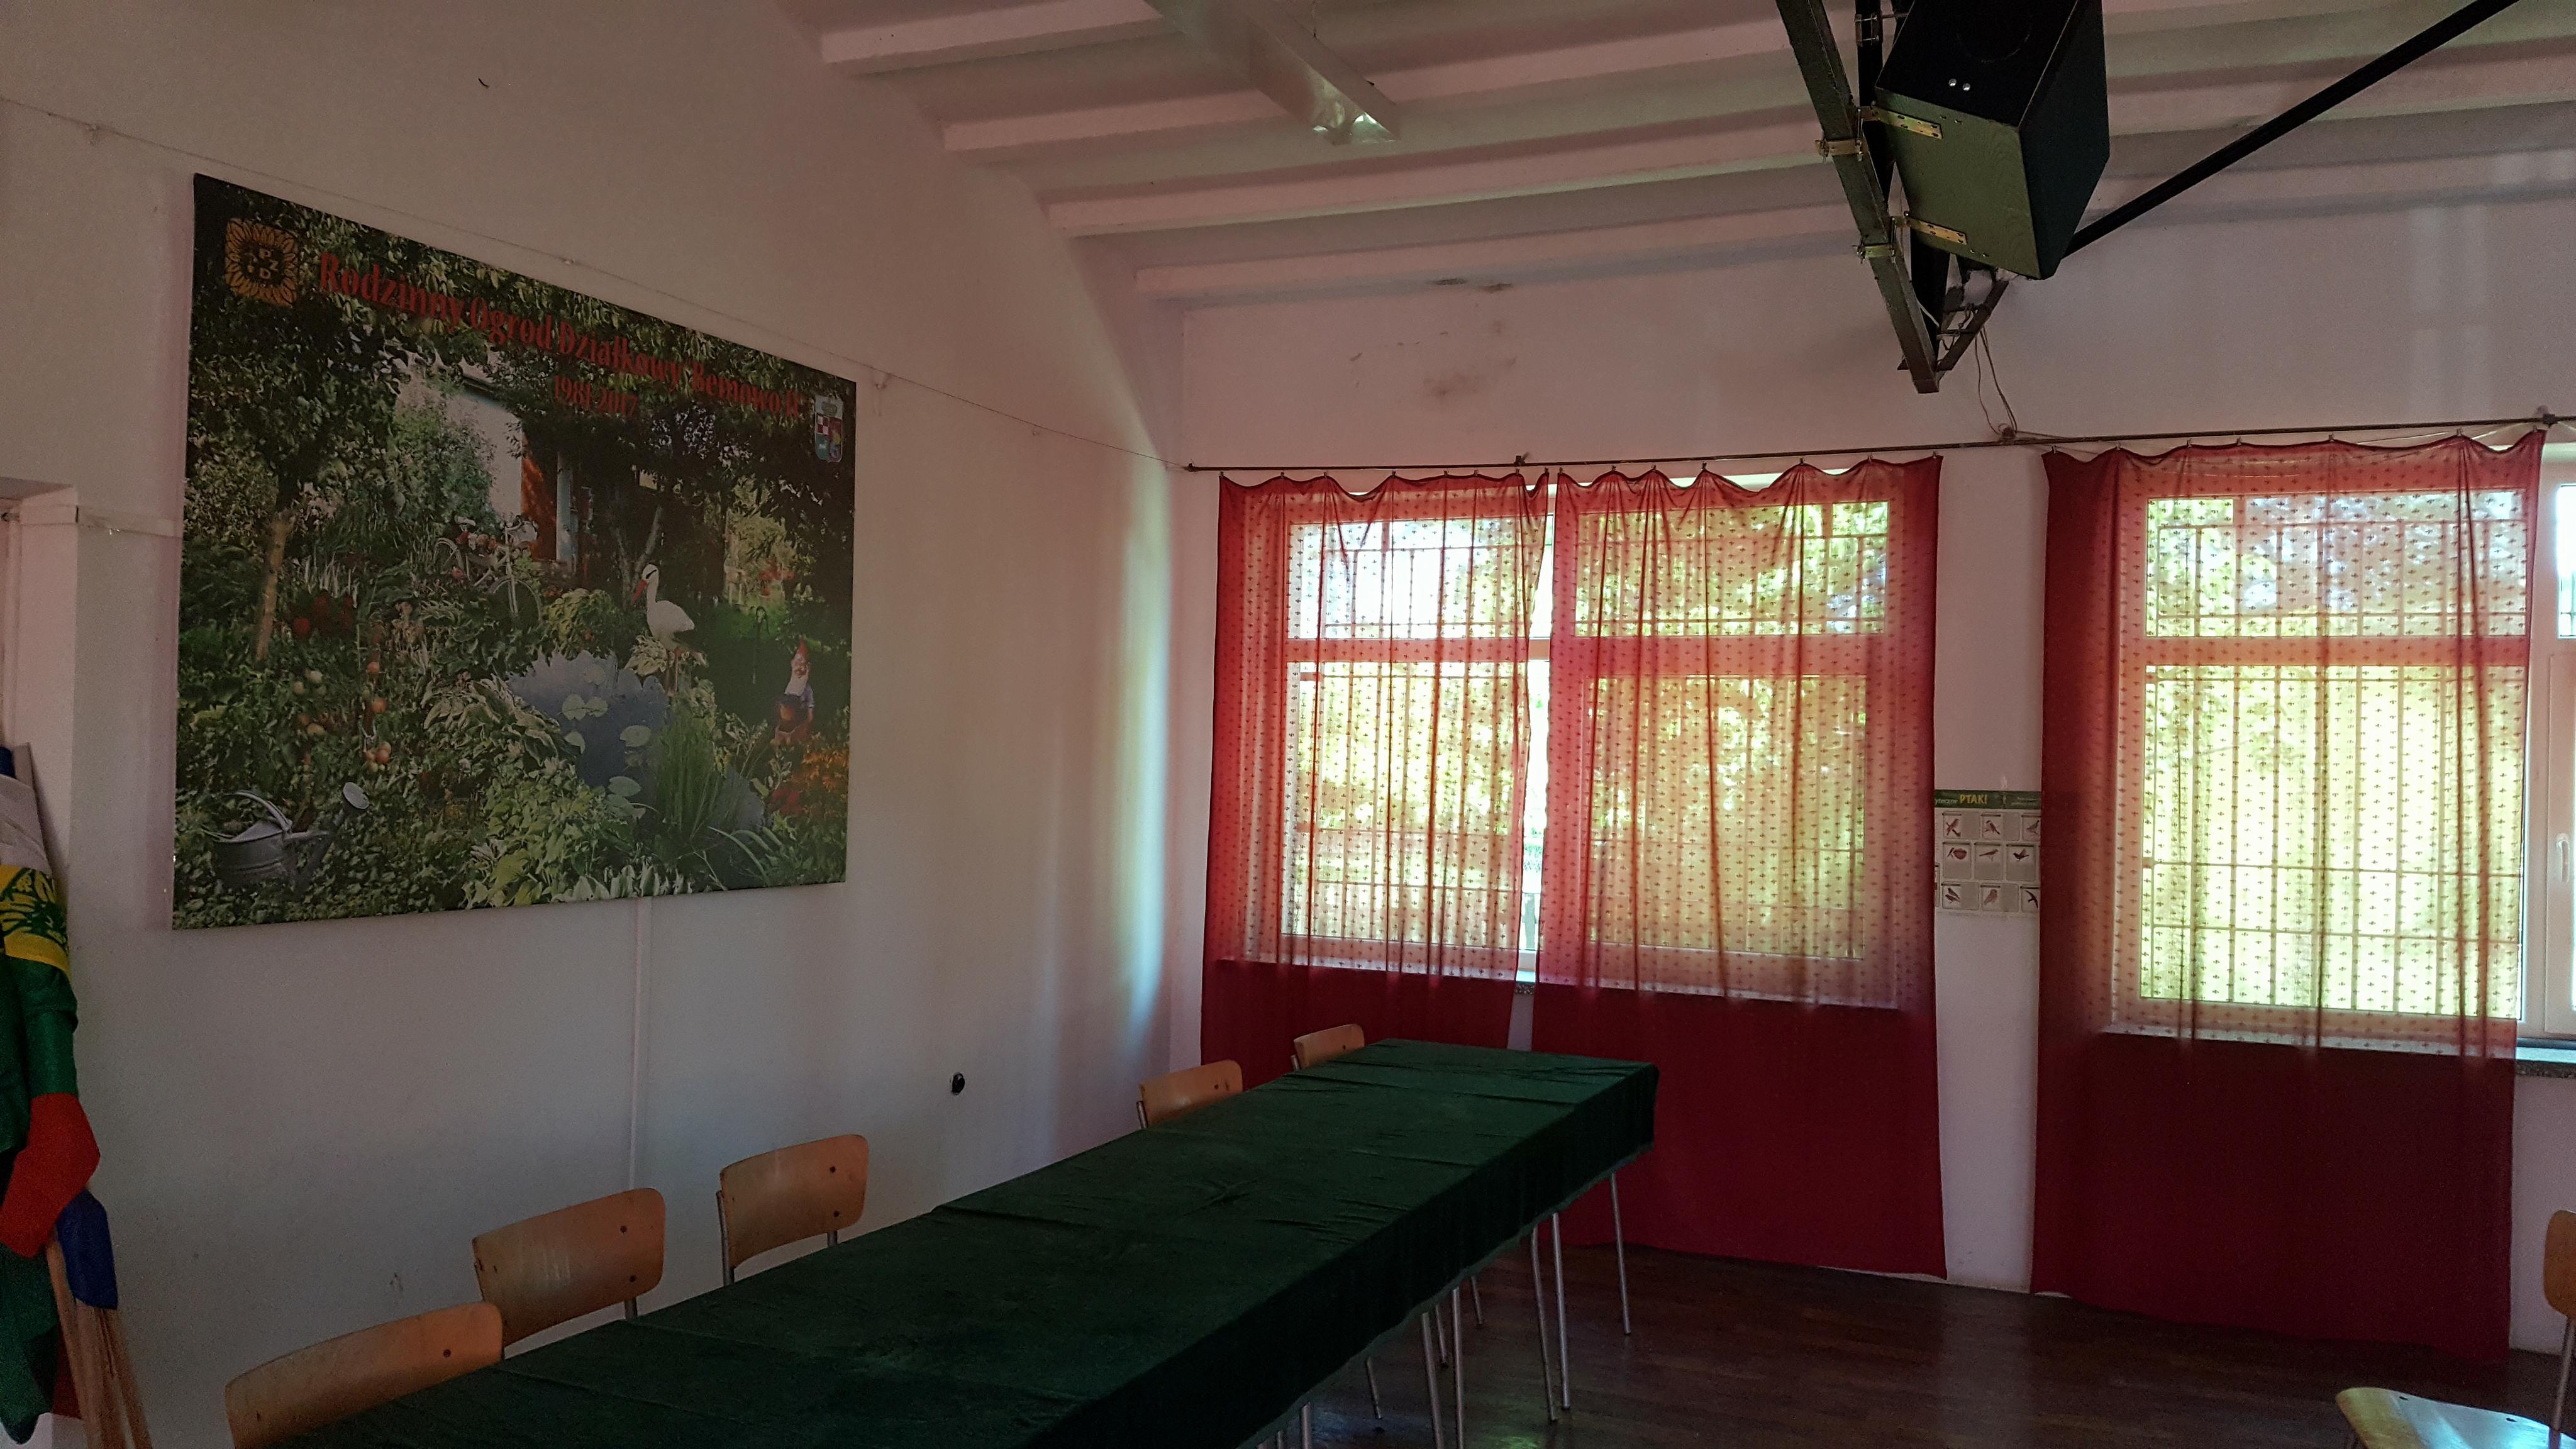 http://atari.org.pl/wapniak18/pics/Bemowo6.jpg